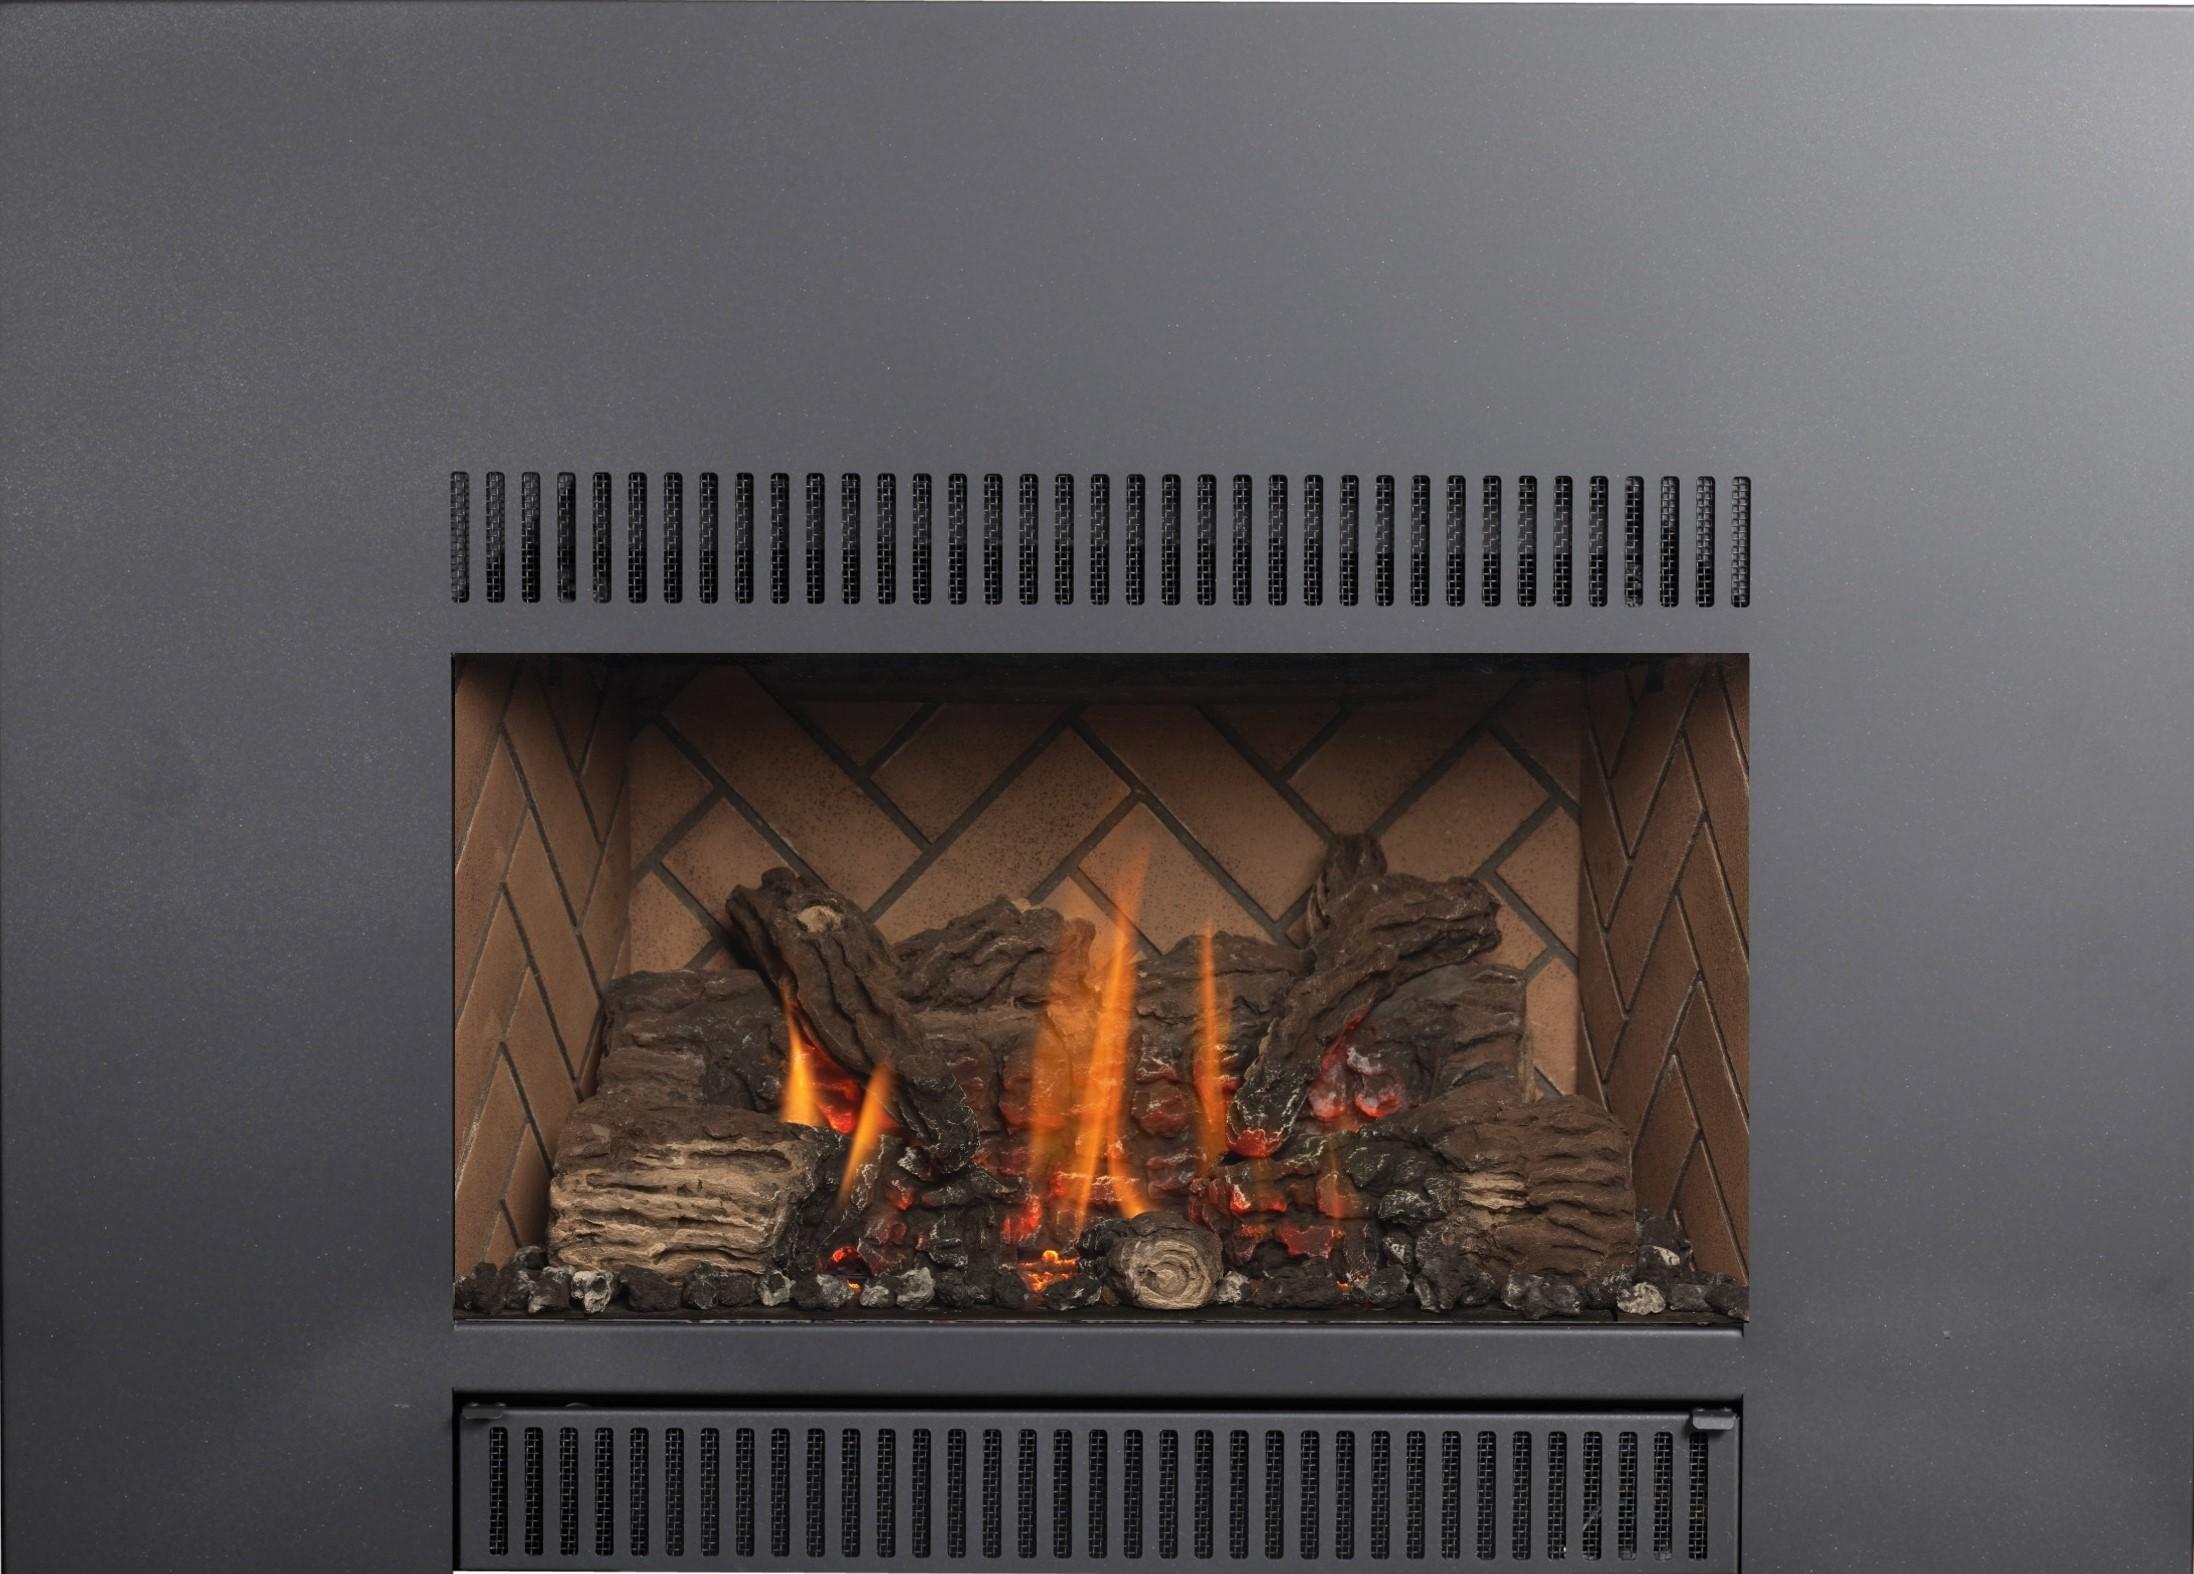 Fireplace Windows Exhaust